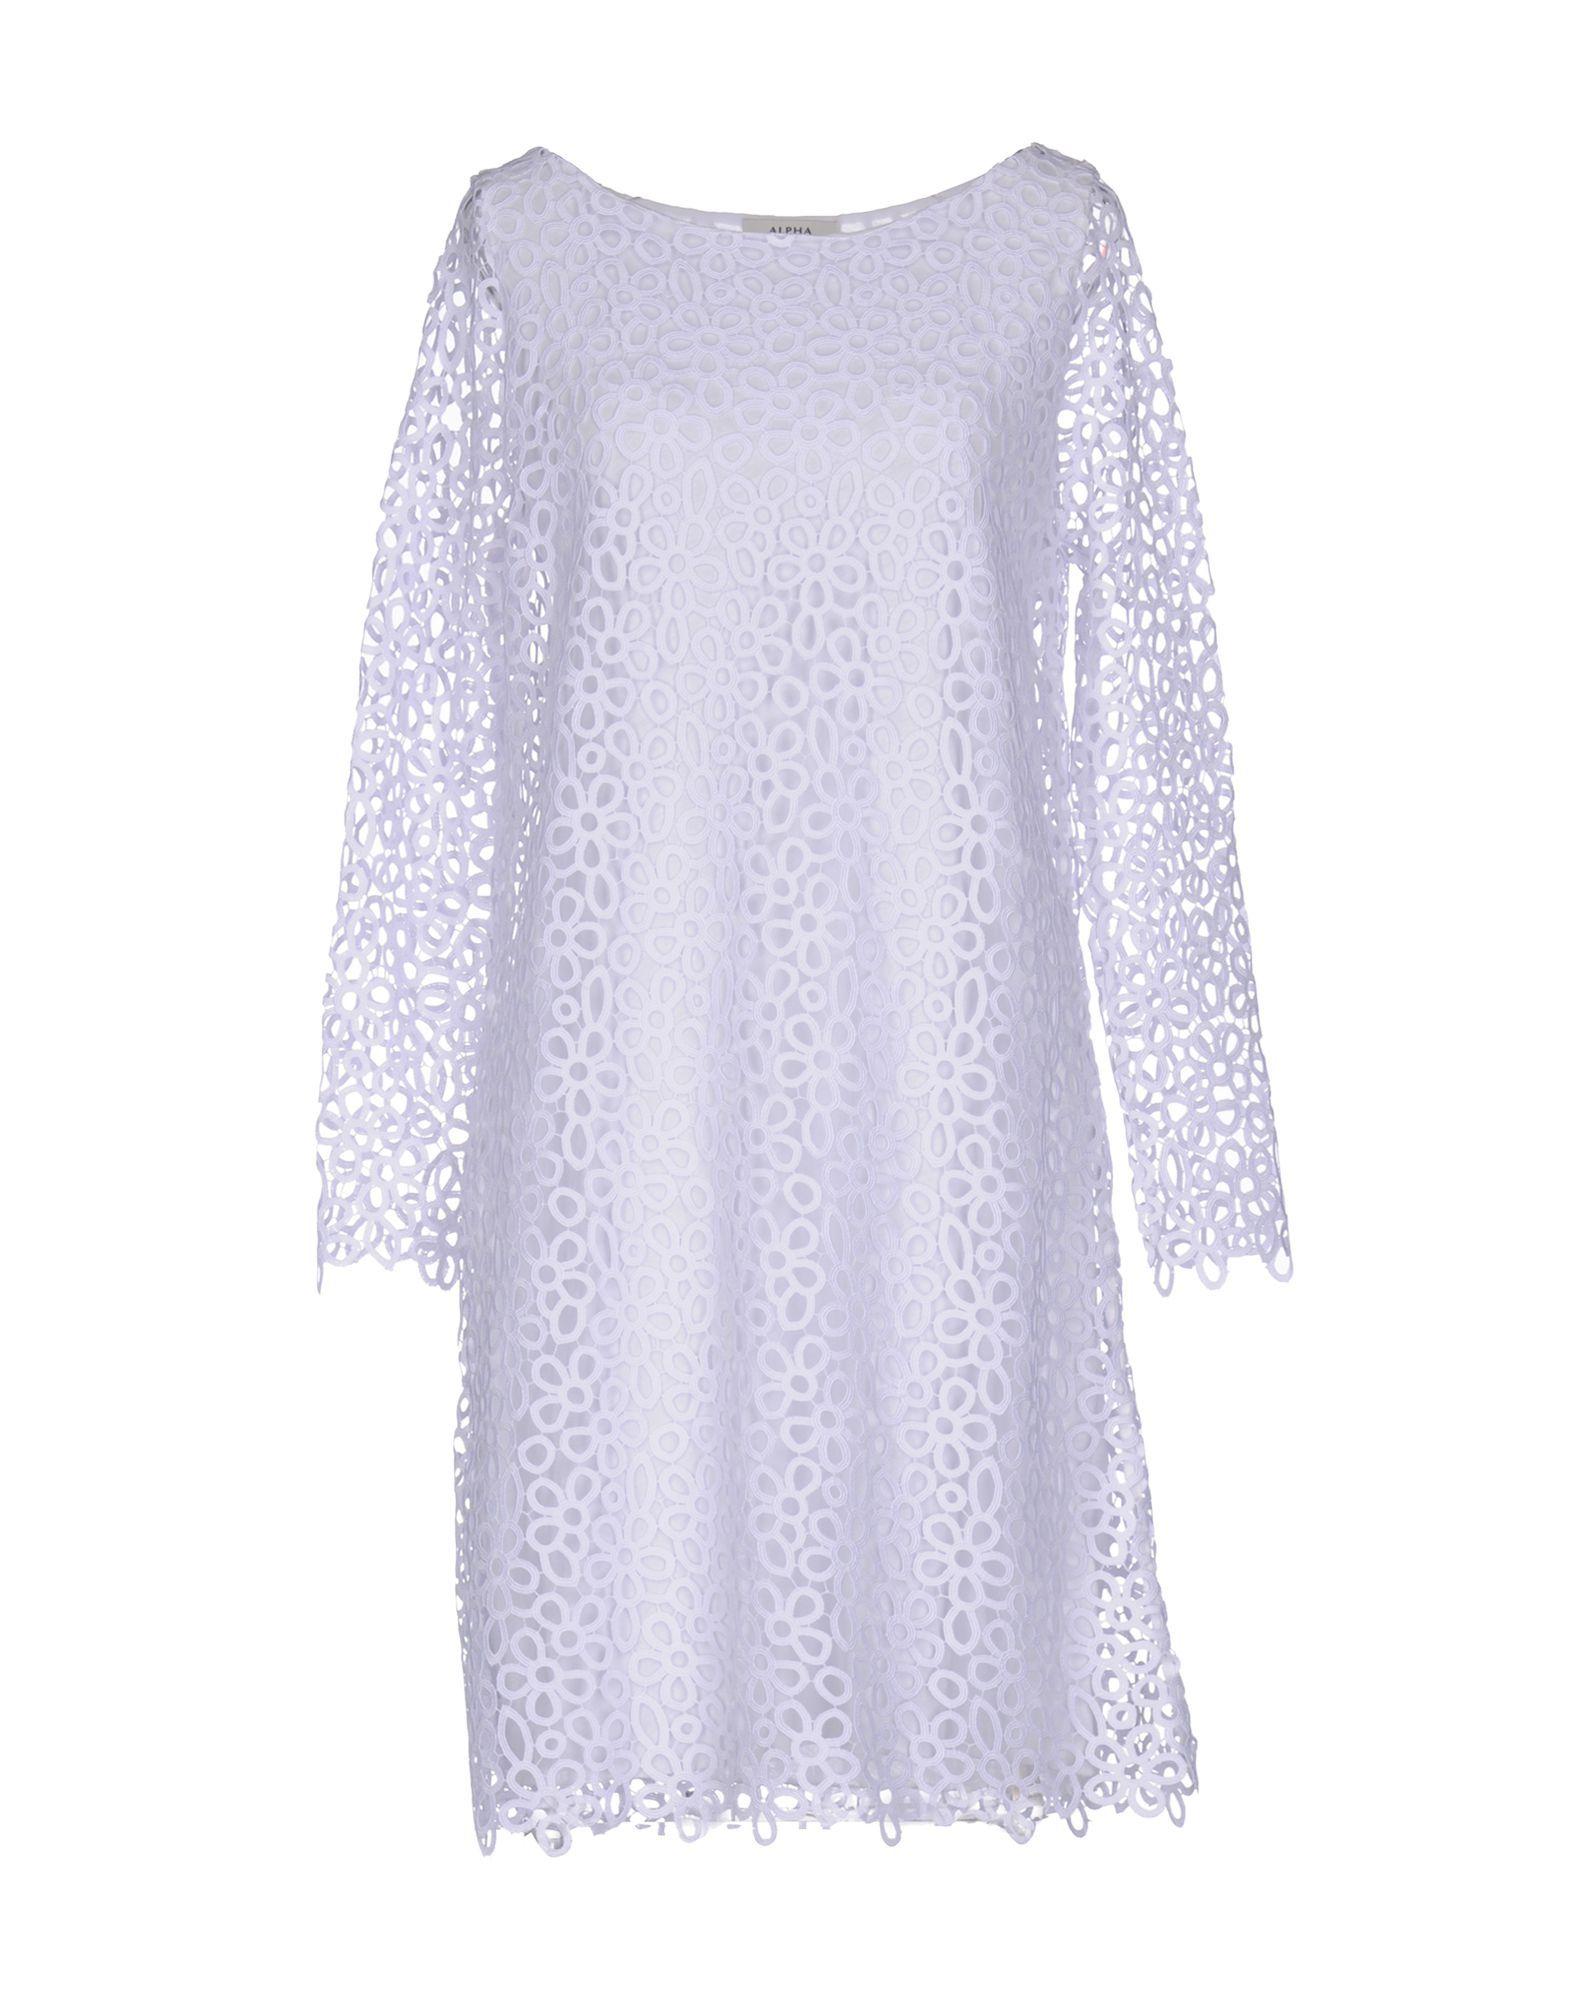 DRESSES Woman Alpha Studio White Polyester